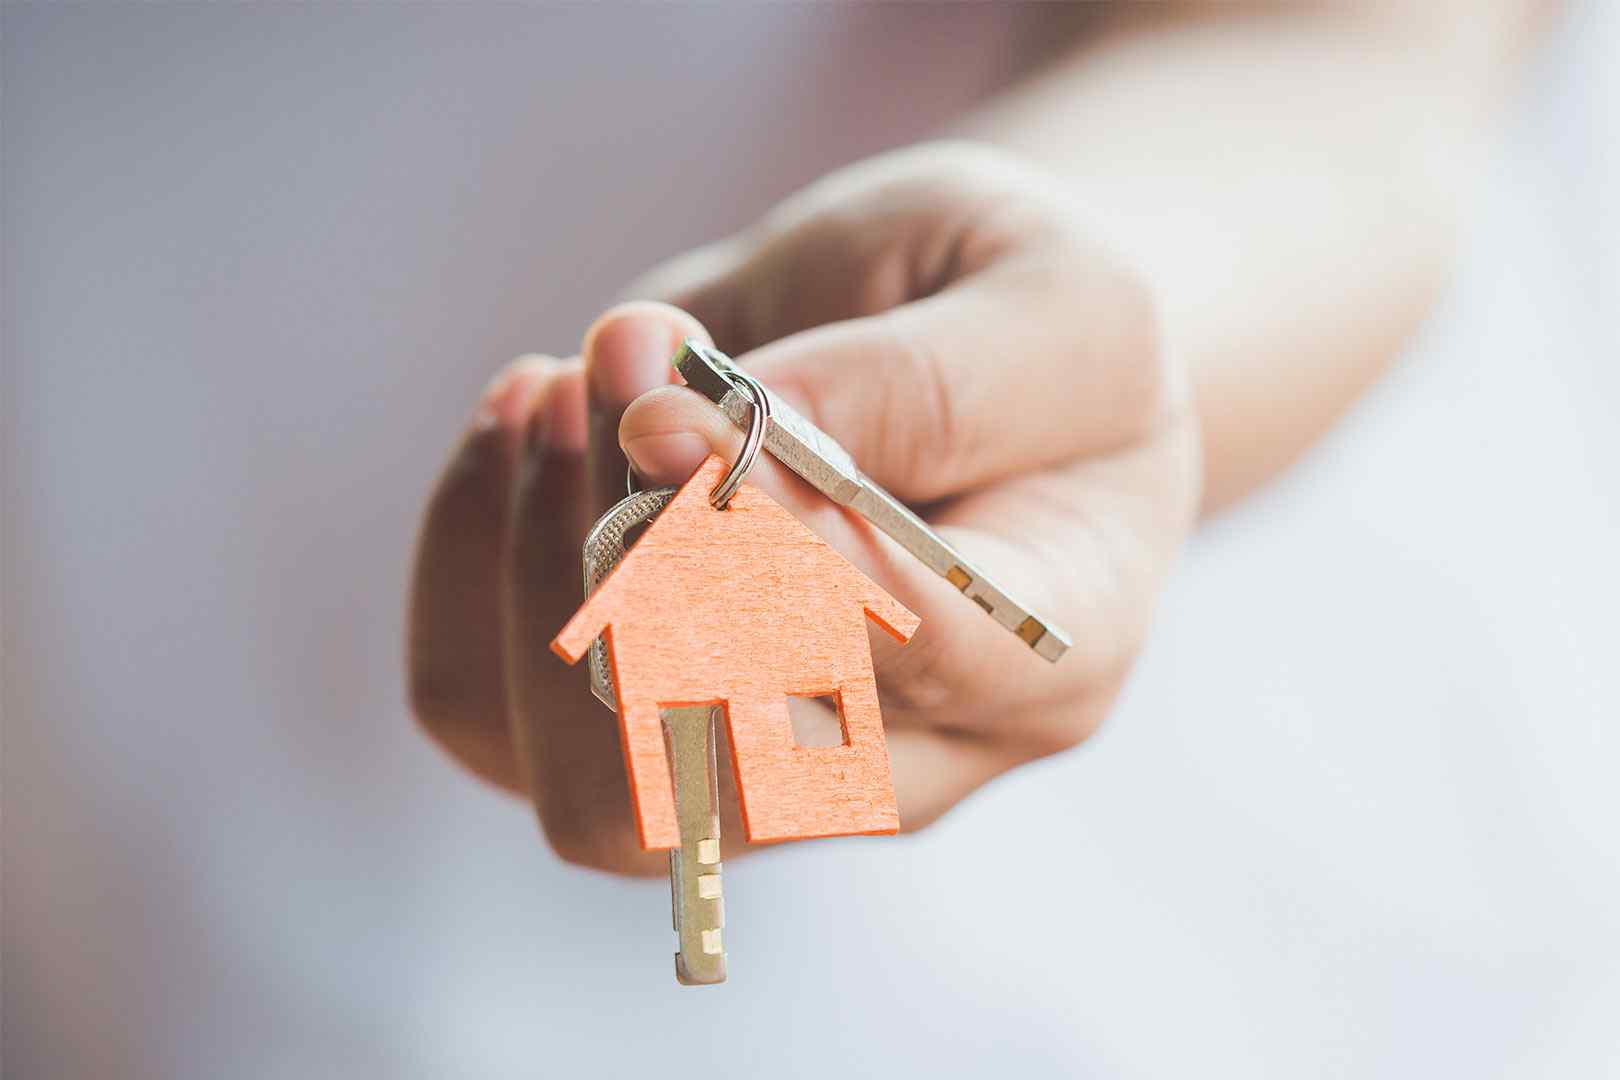 real estate closing attorney bronx ny